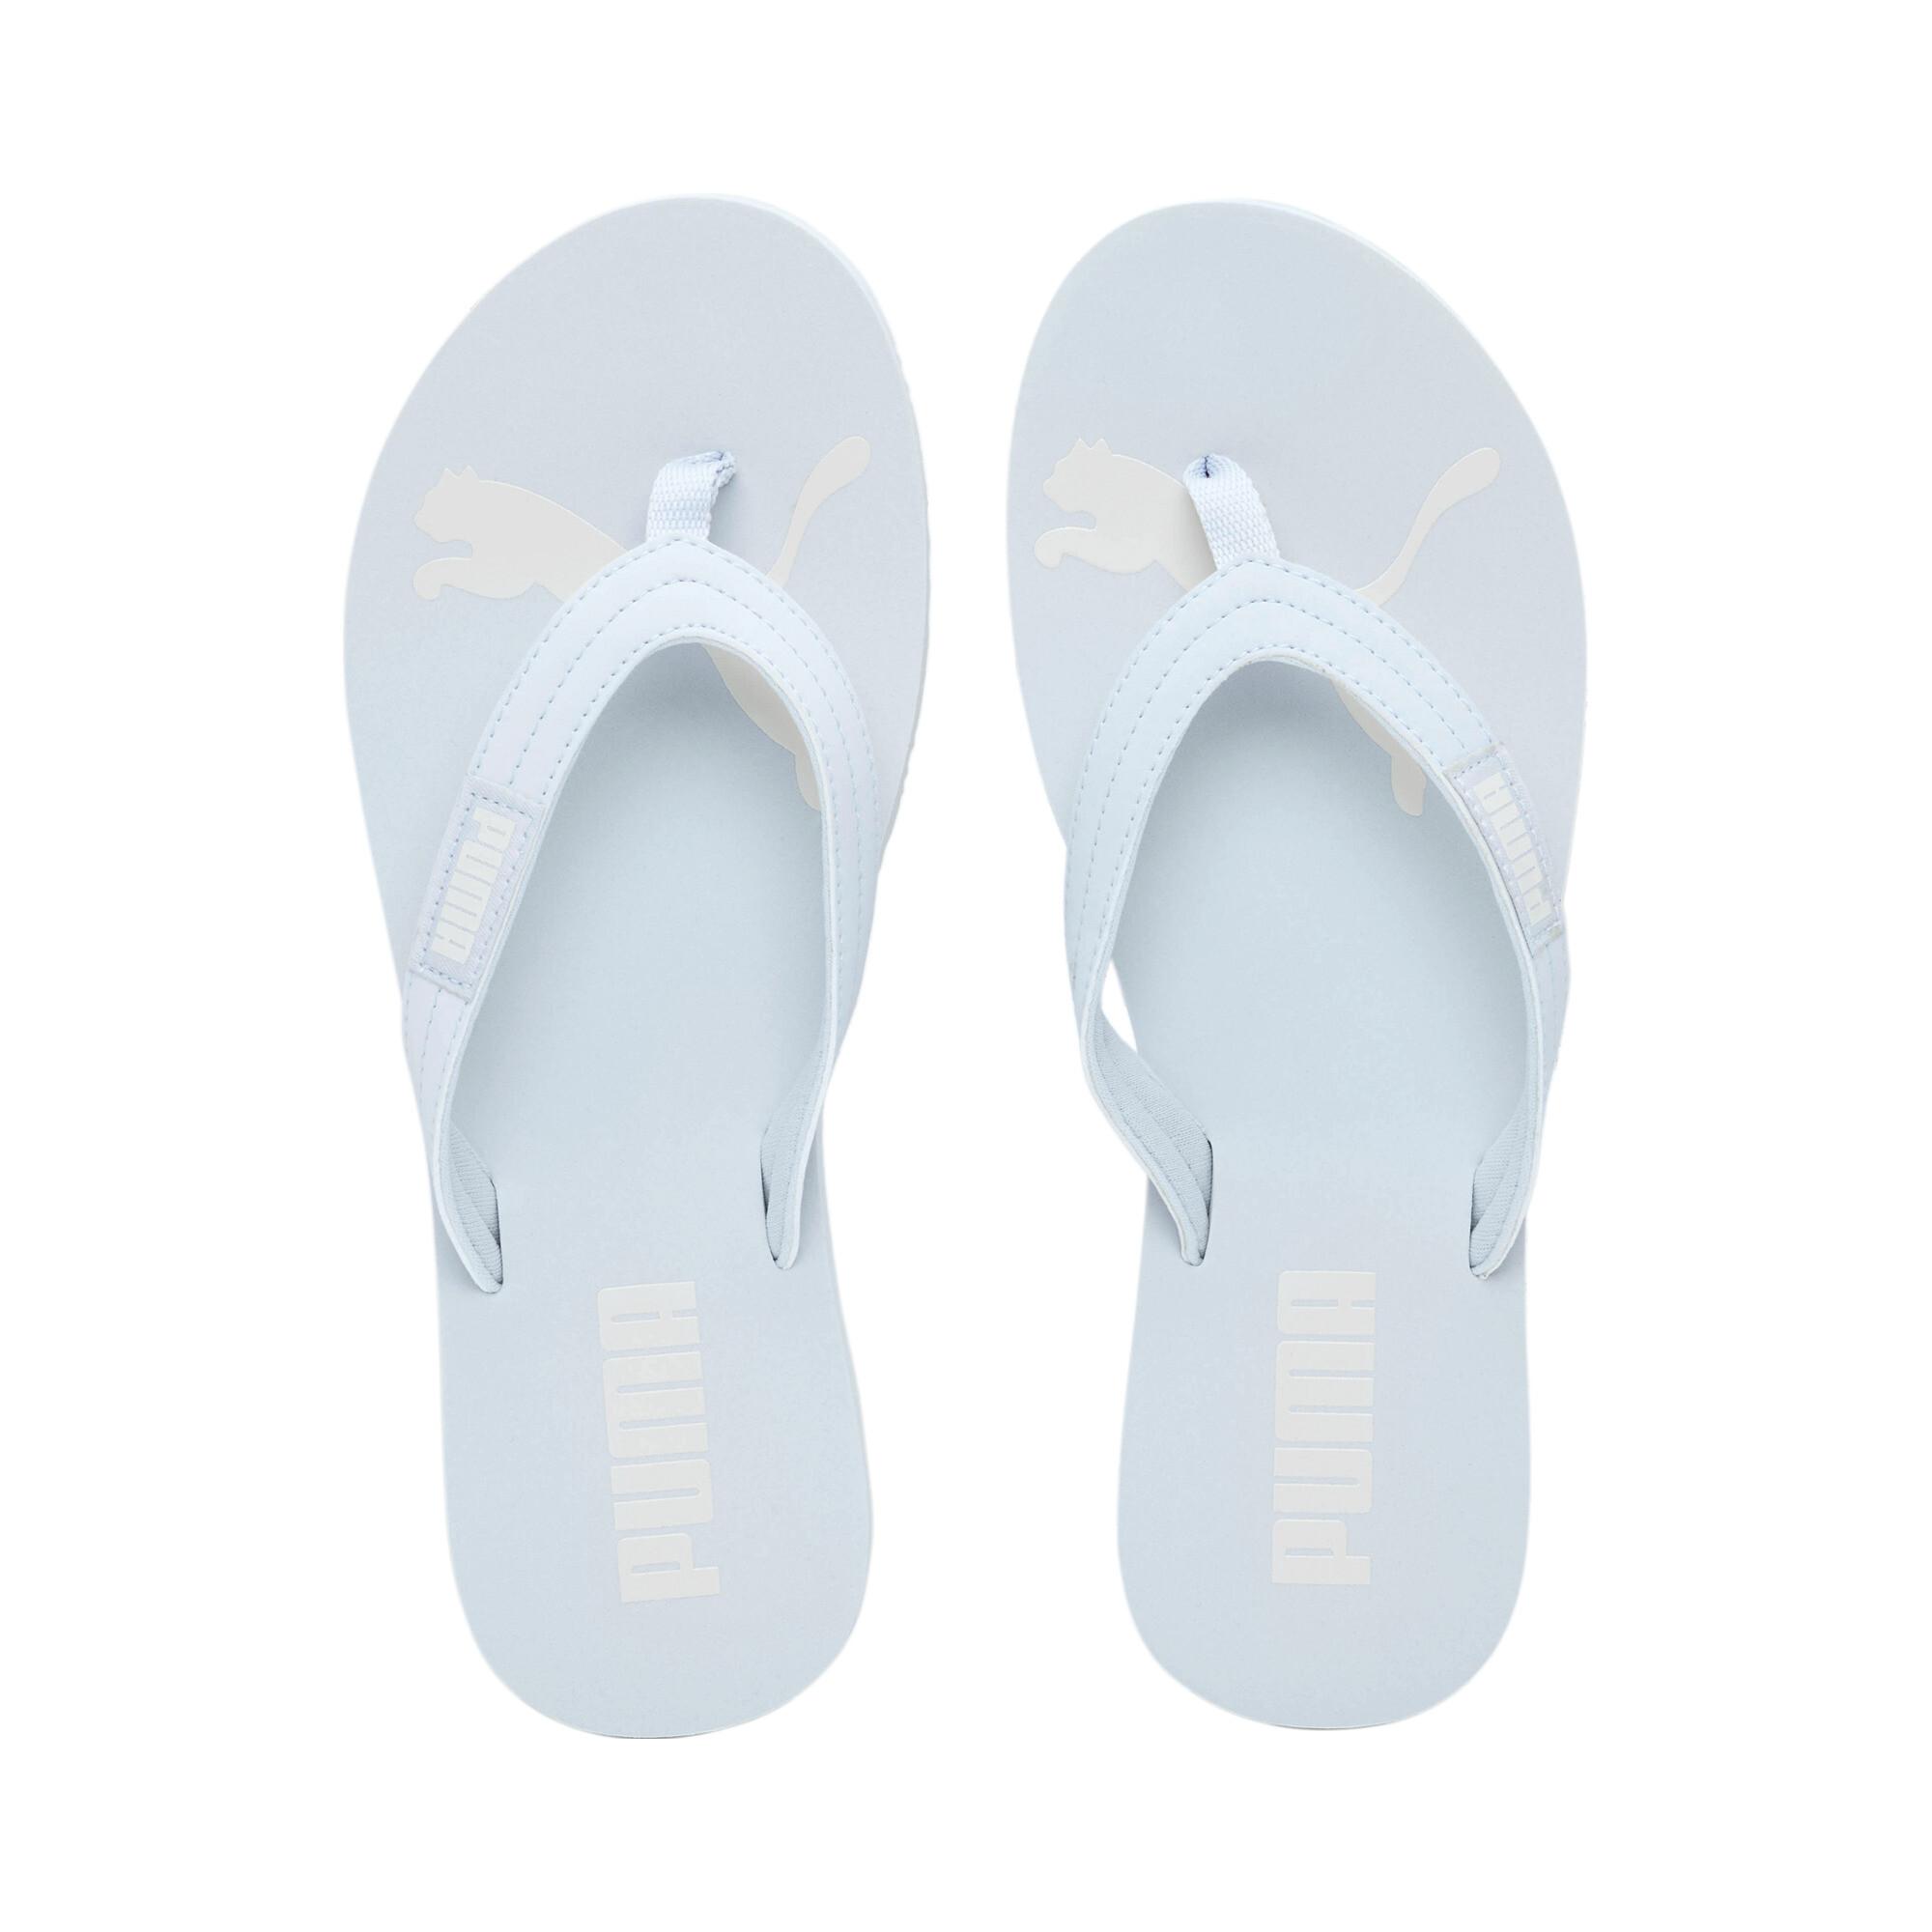 PUMA-Women-039-s-Cozy-Flip-Sandals thumbnail 13